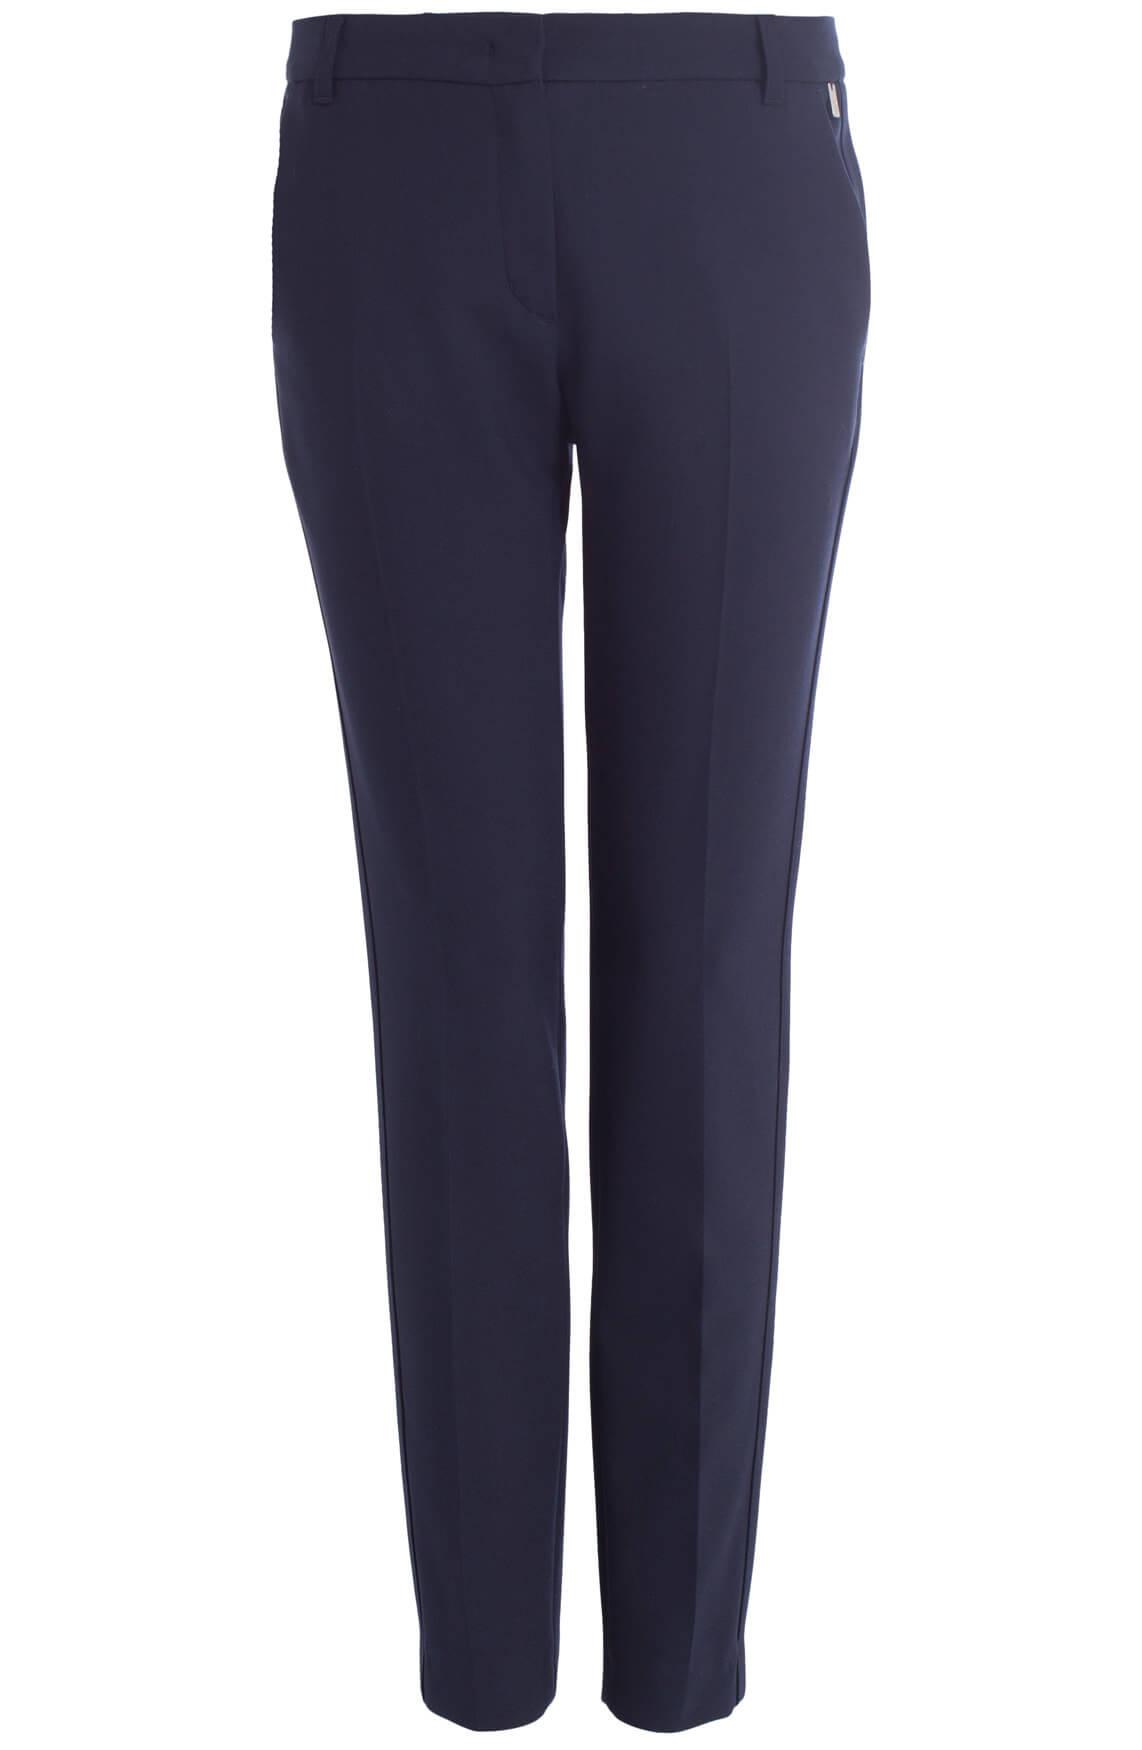 Anna Dames Donkerblauwe pantalon Blauw